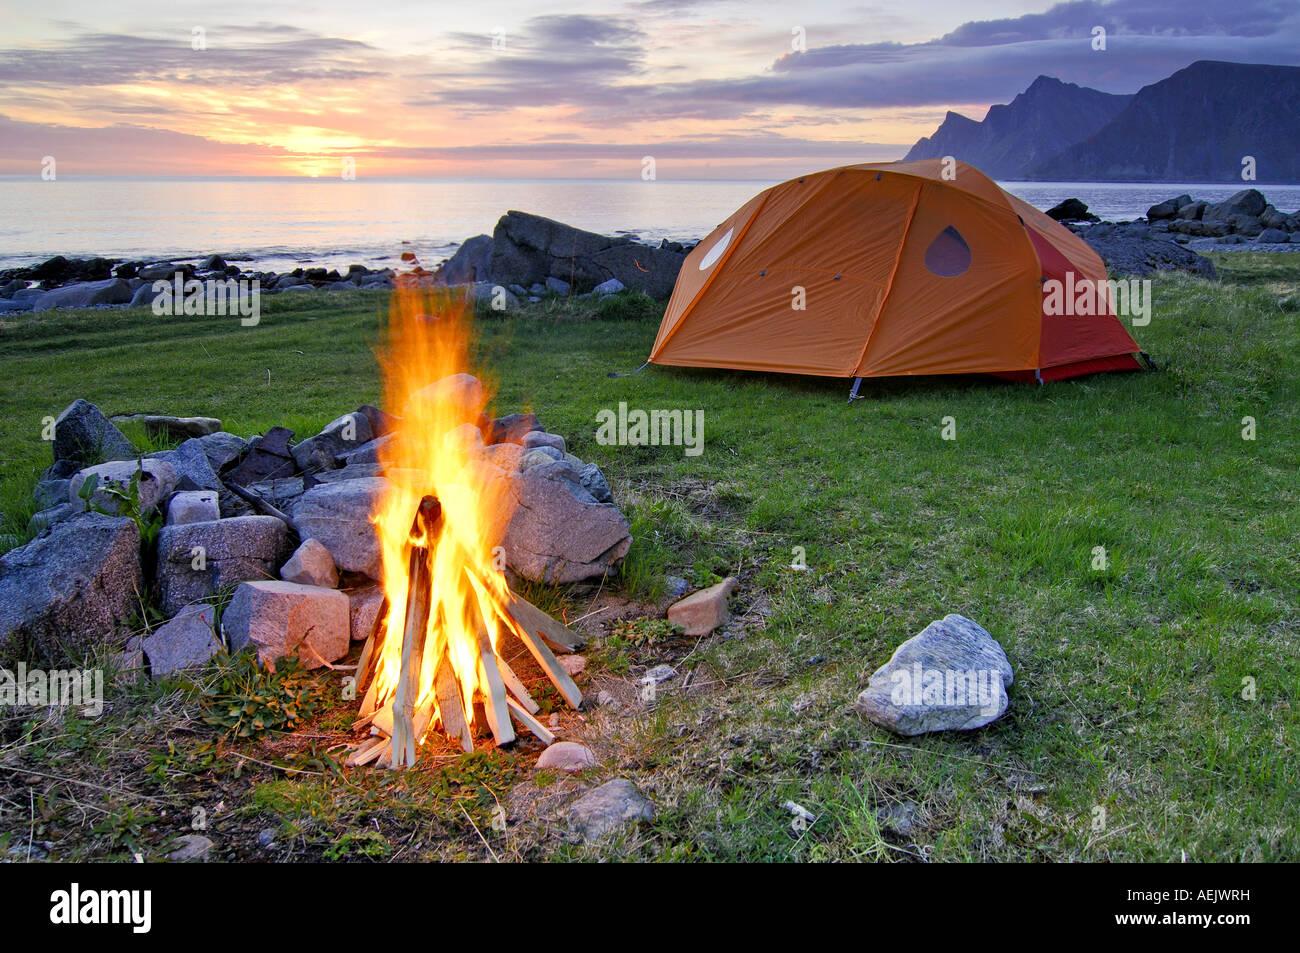 Camp avec tente, soleil de minuit, Austvagoy, Lofoten, Norway, Scandinavia, Europe Photo Stock